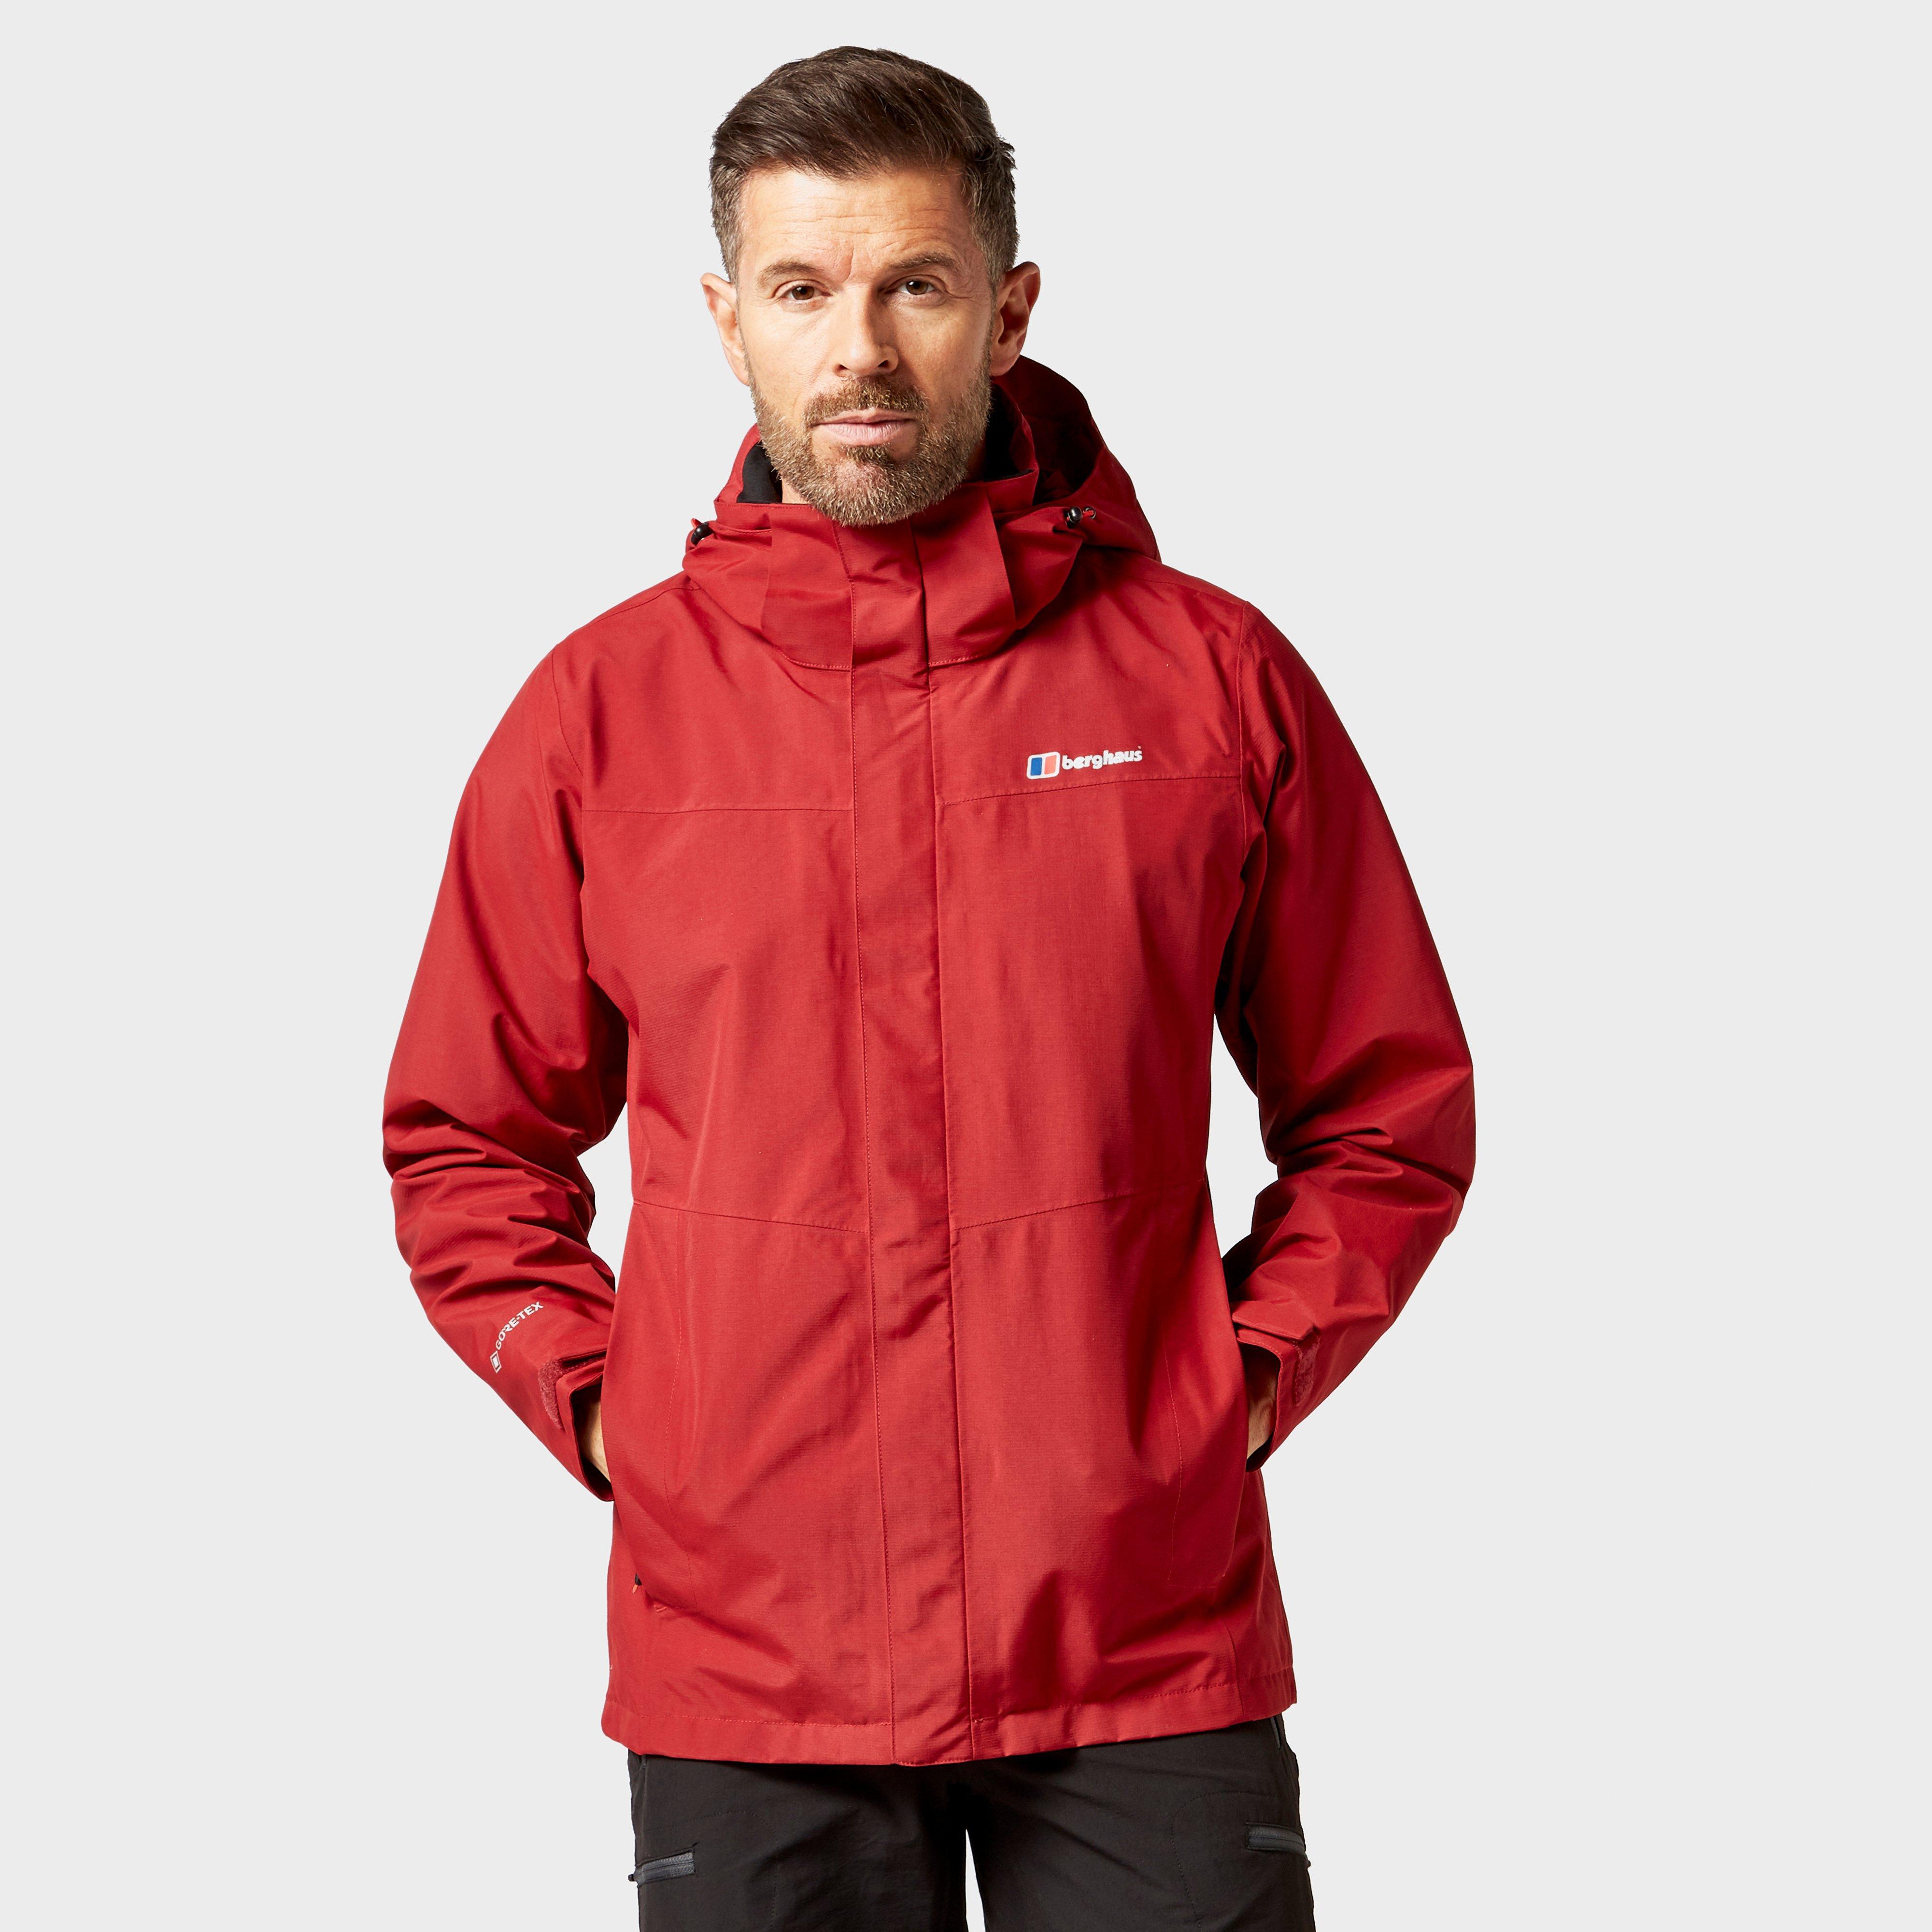 Berghaus Mens Maitland Gore-tex  Jacket - Red/jacket  Red/jacket